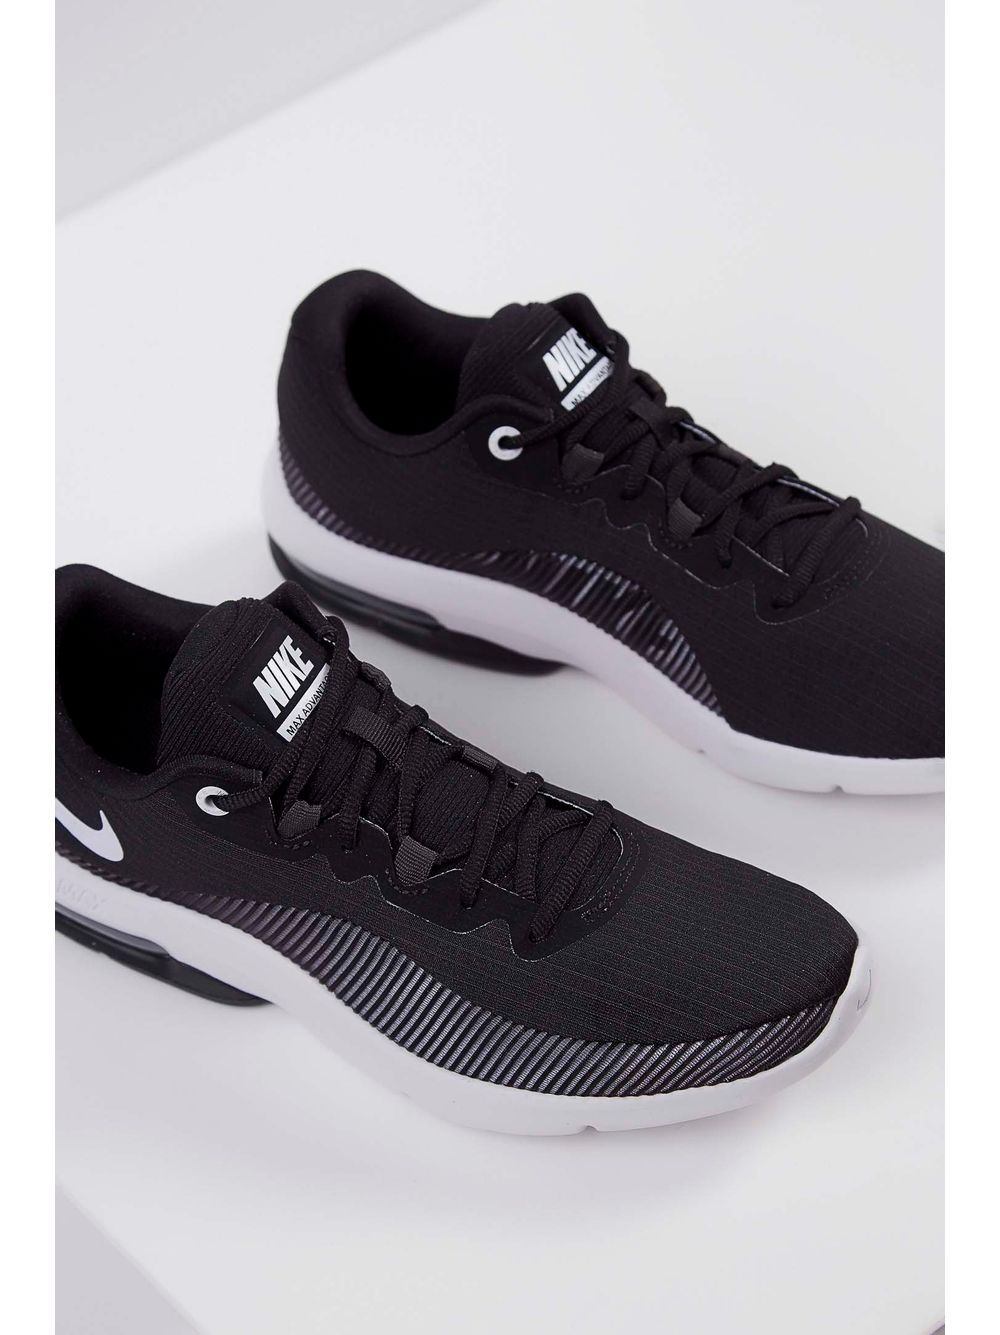 Tênis Nike Air Max Advantage 2 Feminino Preto E Branco